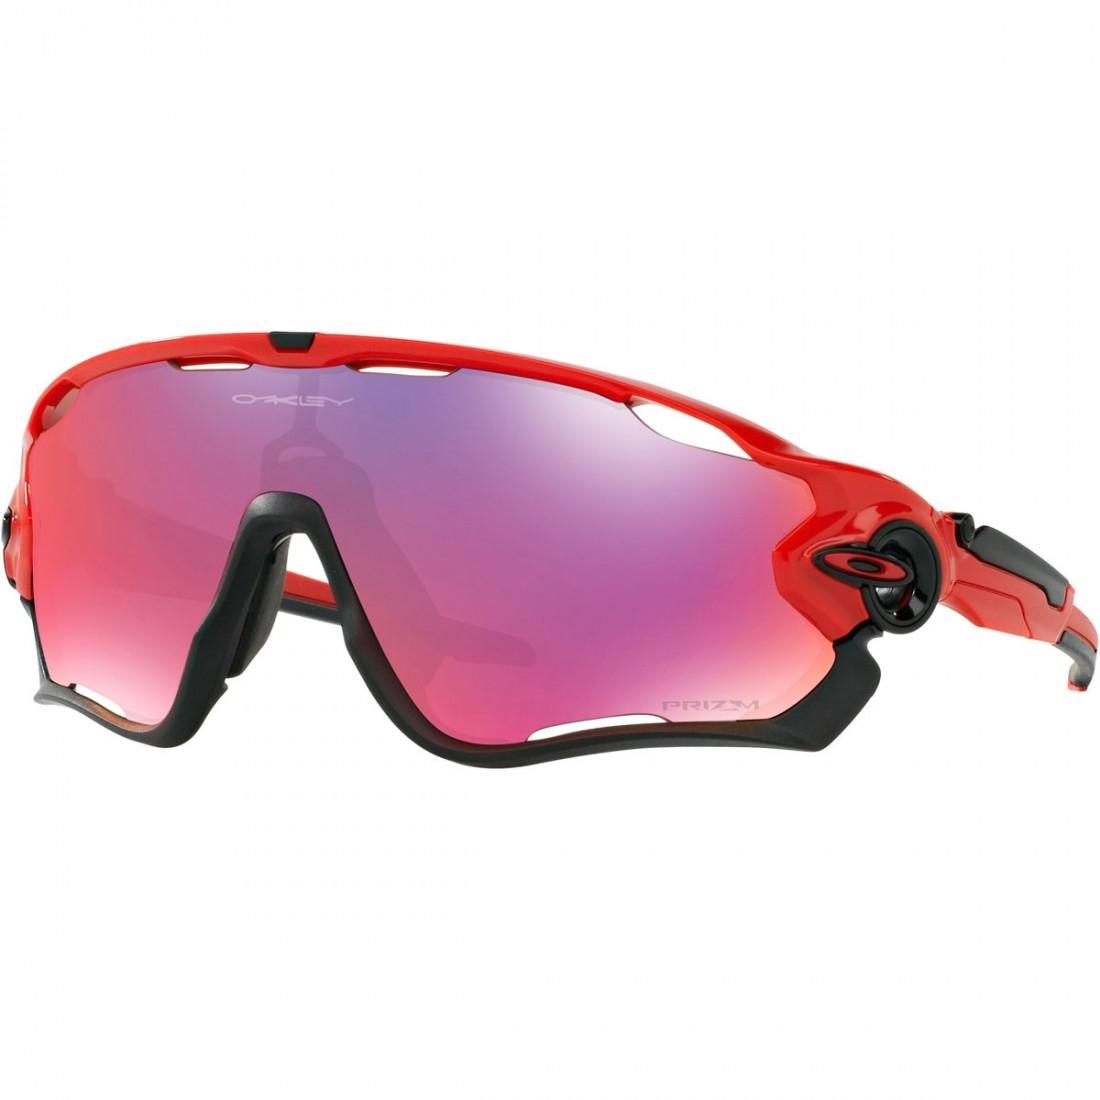 8710c93b3e OAKLEY Jawbreaker Redline   Prizm Road Mask   Goggle · Motocard